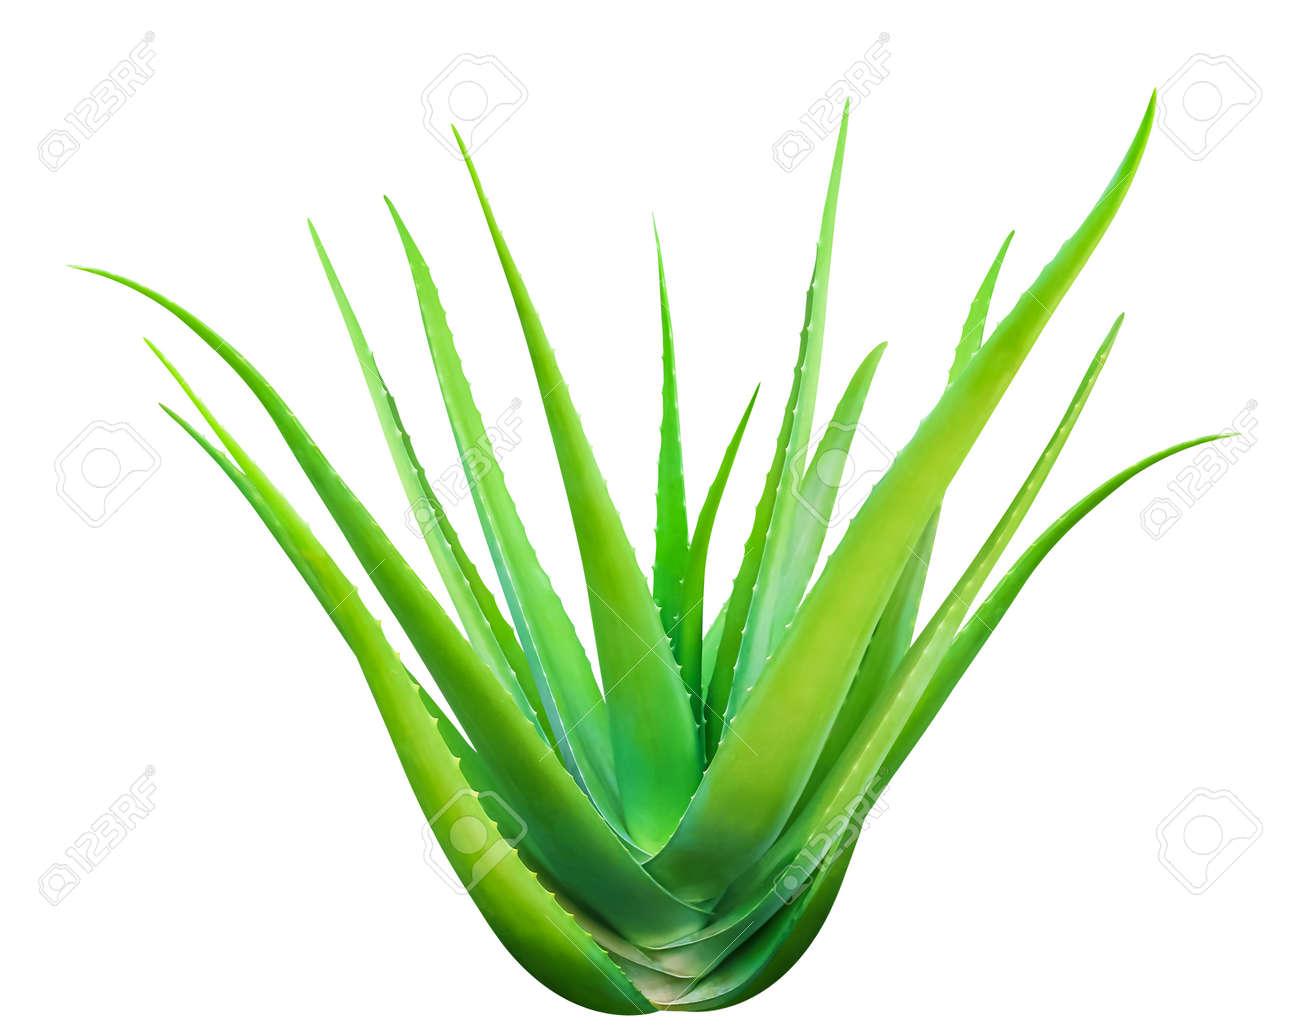 Aloe Vera isolated on white, Aloe Vera leaf, Aloe Vera fresh - 166688749